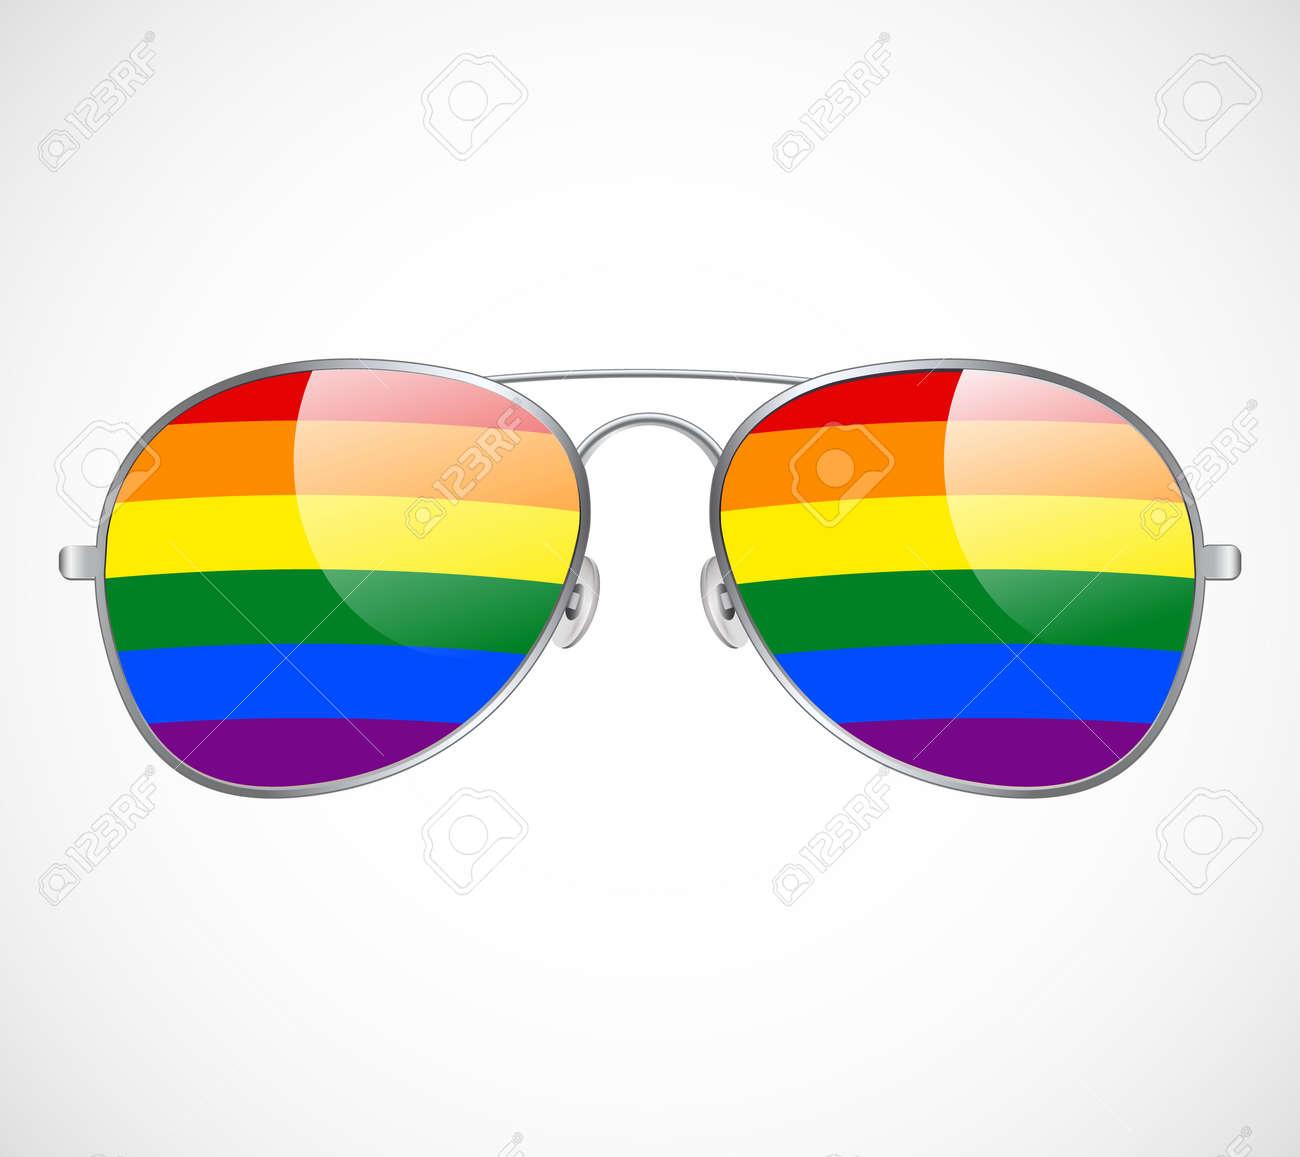 Sunglasses Aviator Abstract Rainbow lenses Vector Illustration Background. LGBT - 170746986